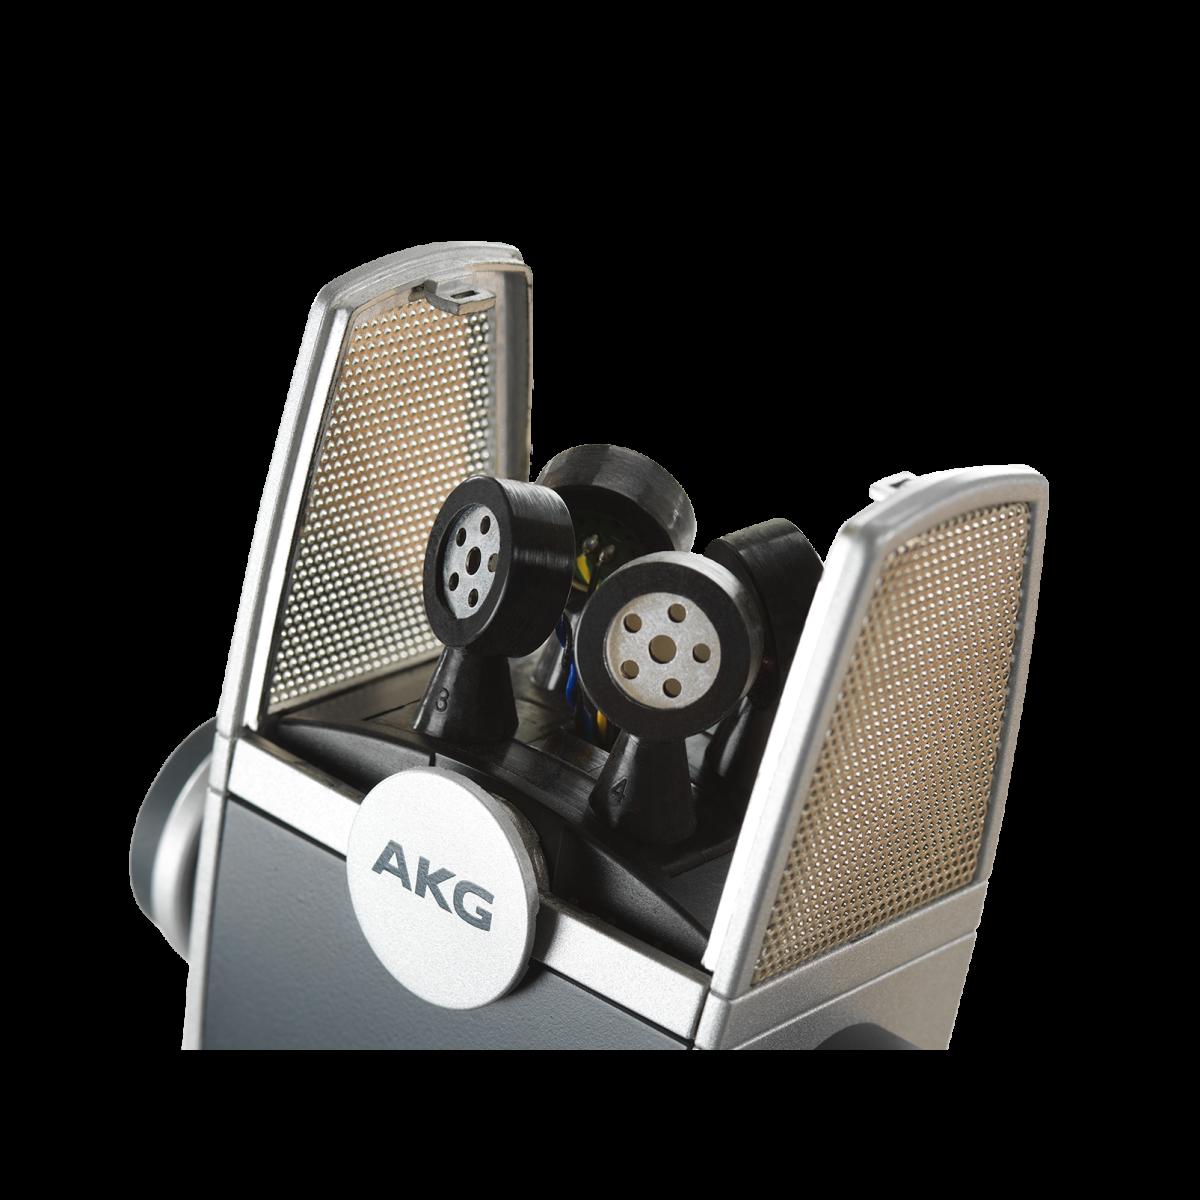 AKG_USB_Mic_capsules_clipped_1605x1605